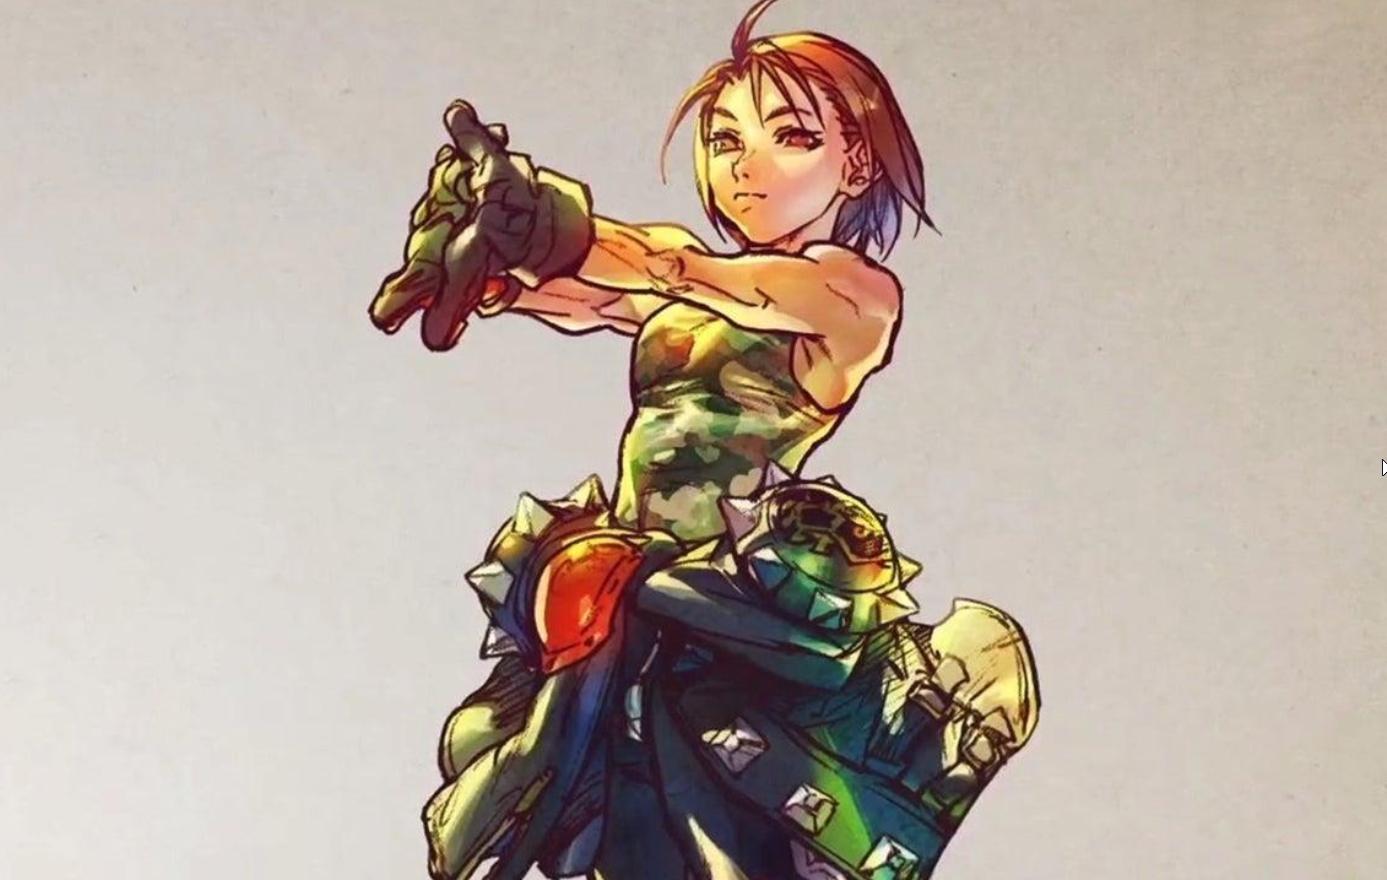 Capcom's Street Fighter V New Characters; Rose, Oro, Akira Revealed on Stream